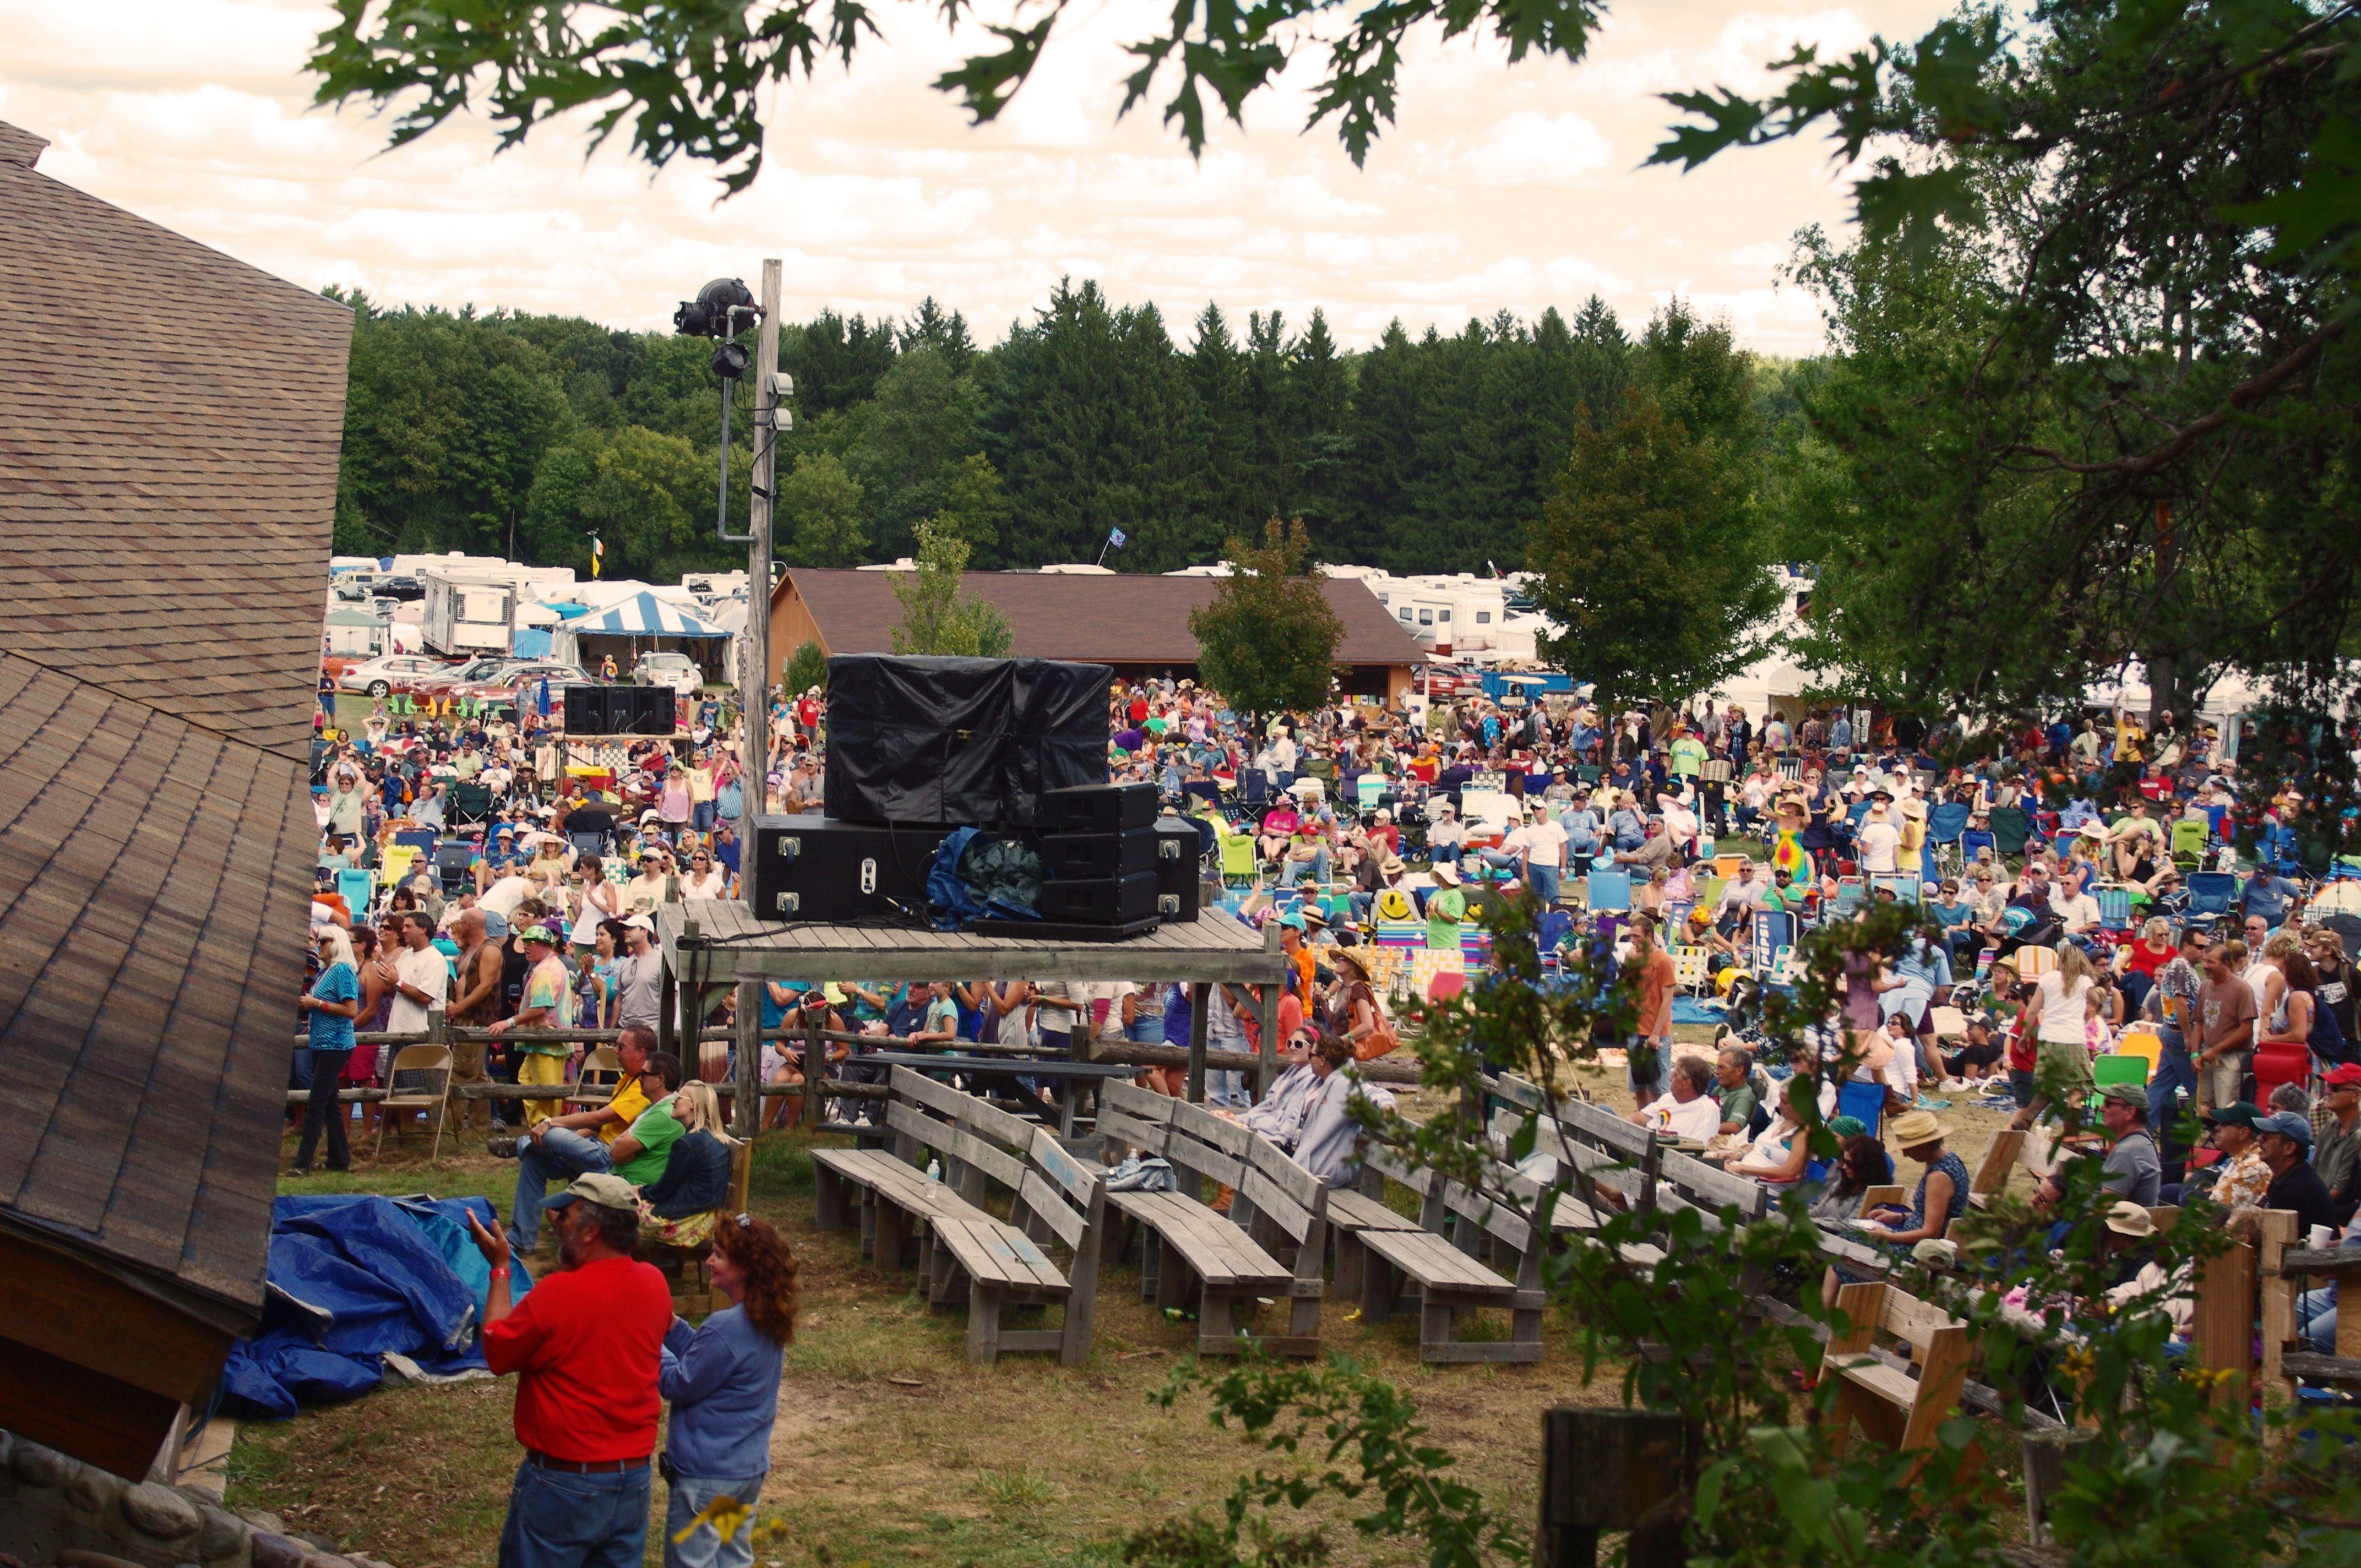 Wheatland music festival lineup